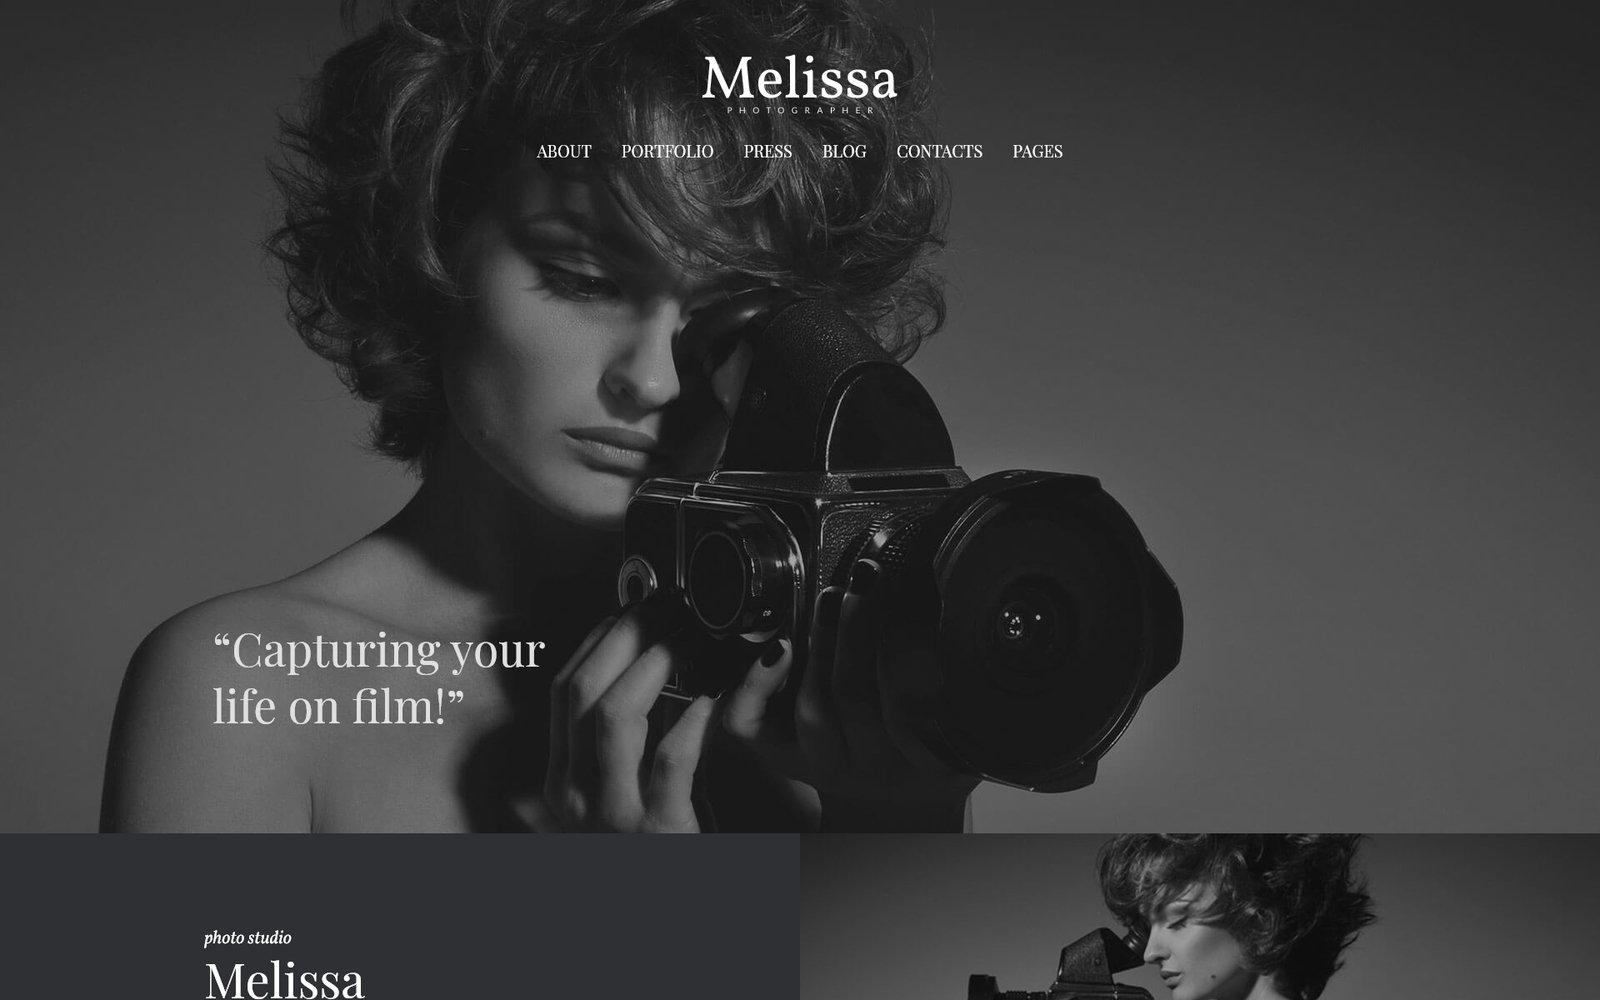 Responsive Melissa - Art & Photography & Photographer Portfolio & Photo Studio Responsive WordPress Theme #52153 - Ekran resmi